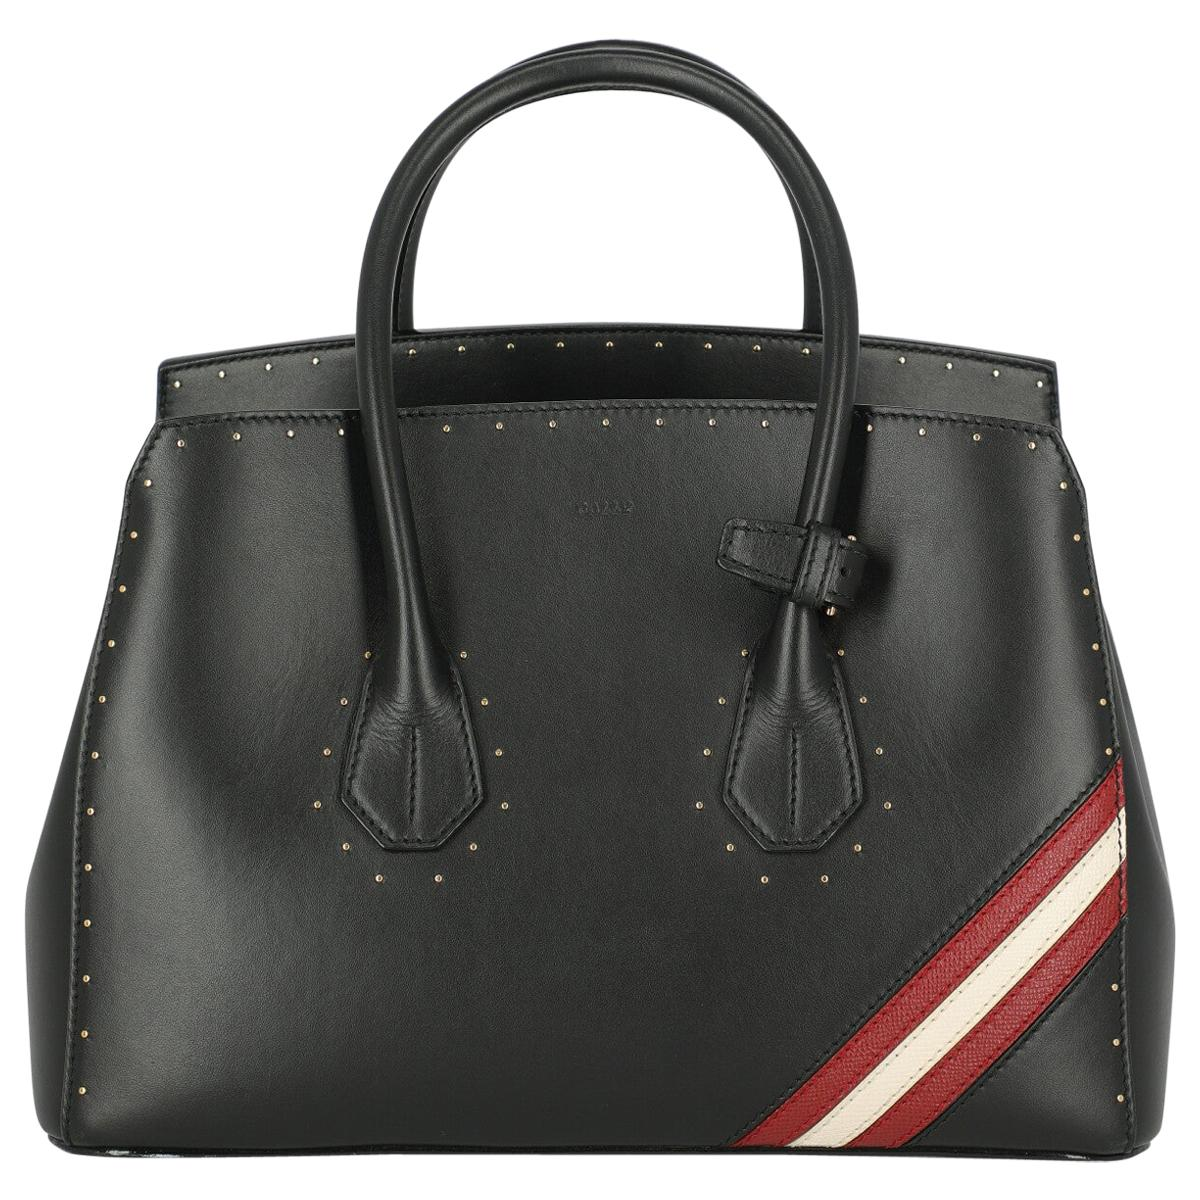 Bally Woman Handbag  Black Leather